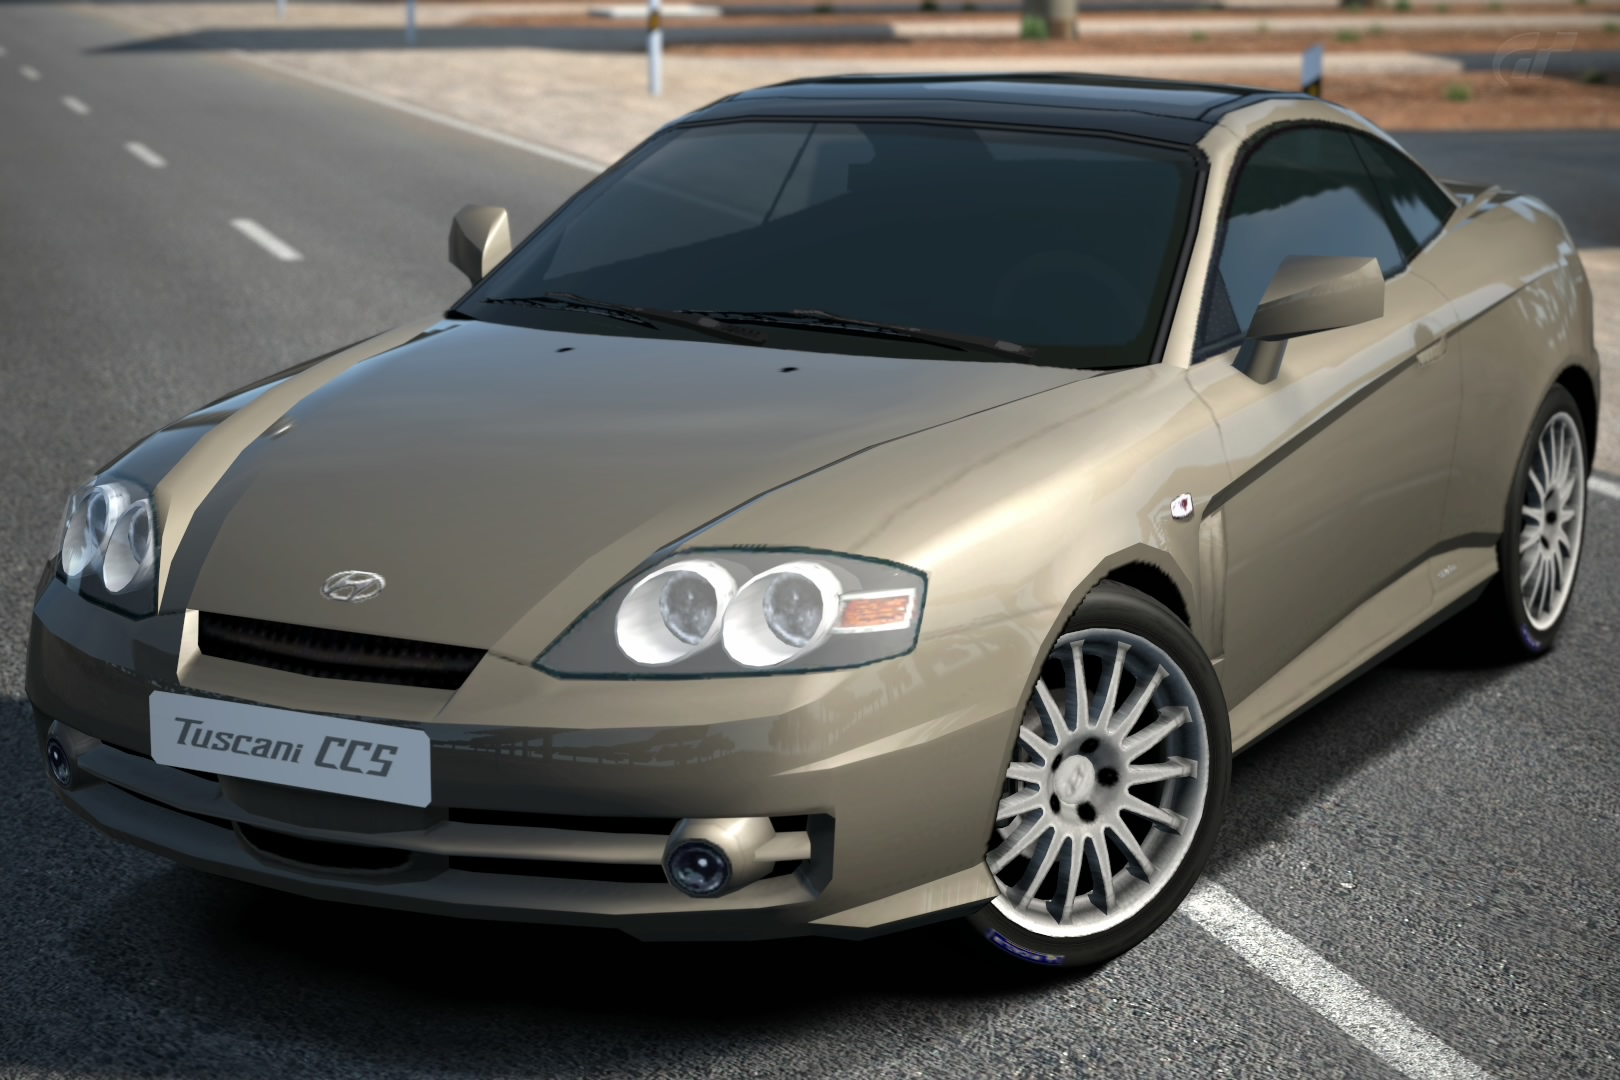 Hyundai Tuscani Ccs 03 Gran Turismo Wiki Fandom Powered By Wikia